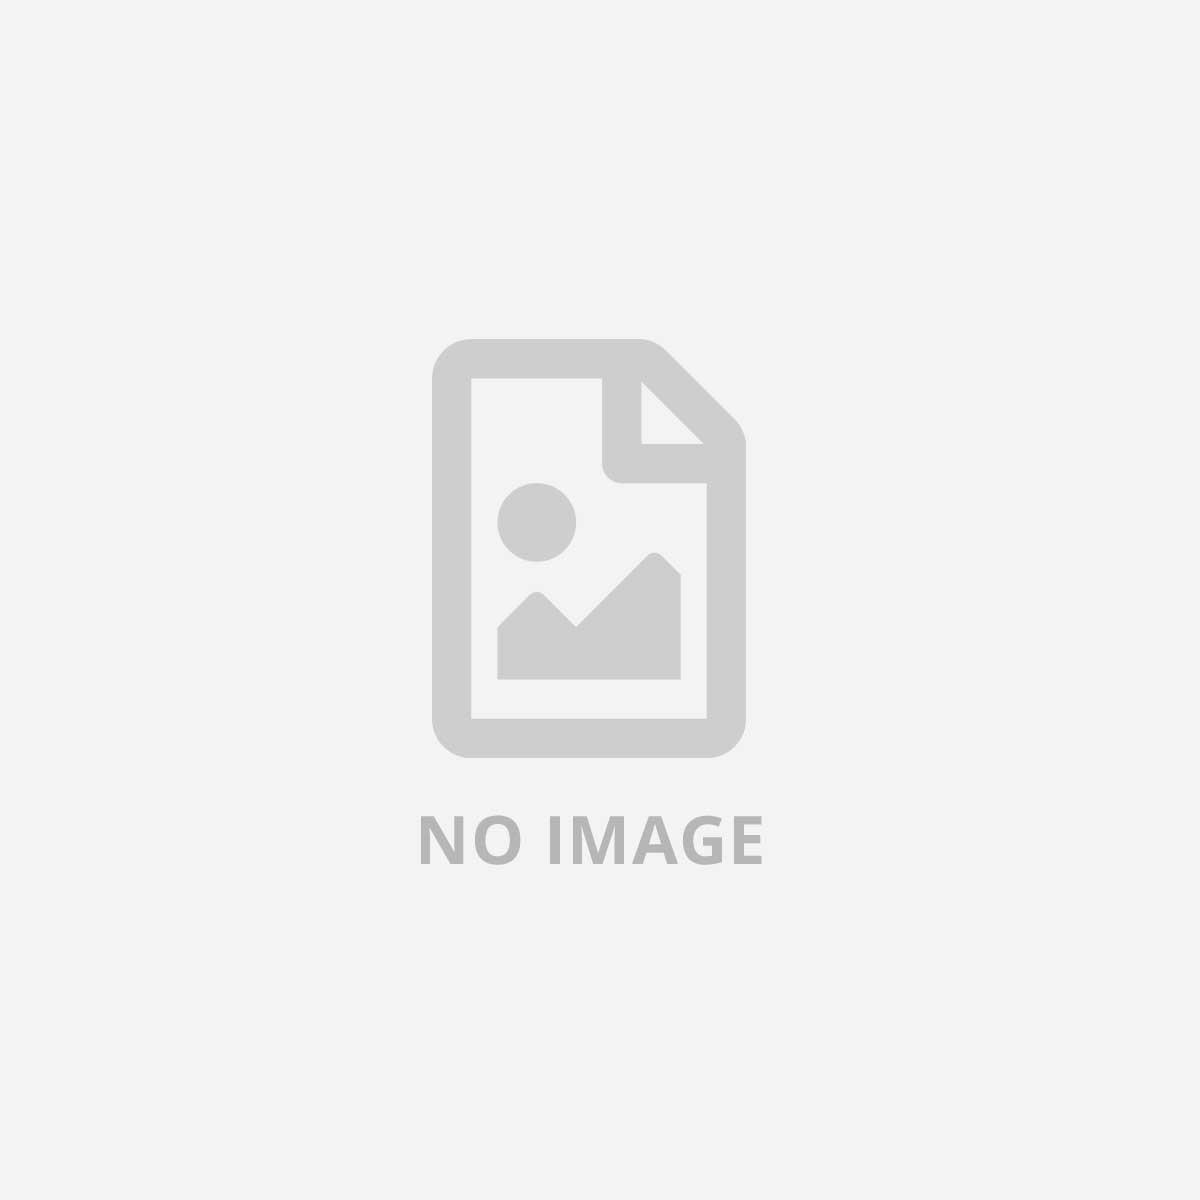 PHILIPS DVT1110 PC CON RIC VOCALE